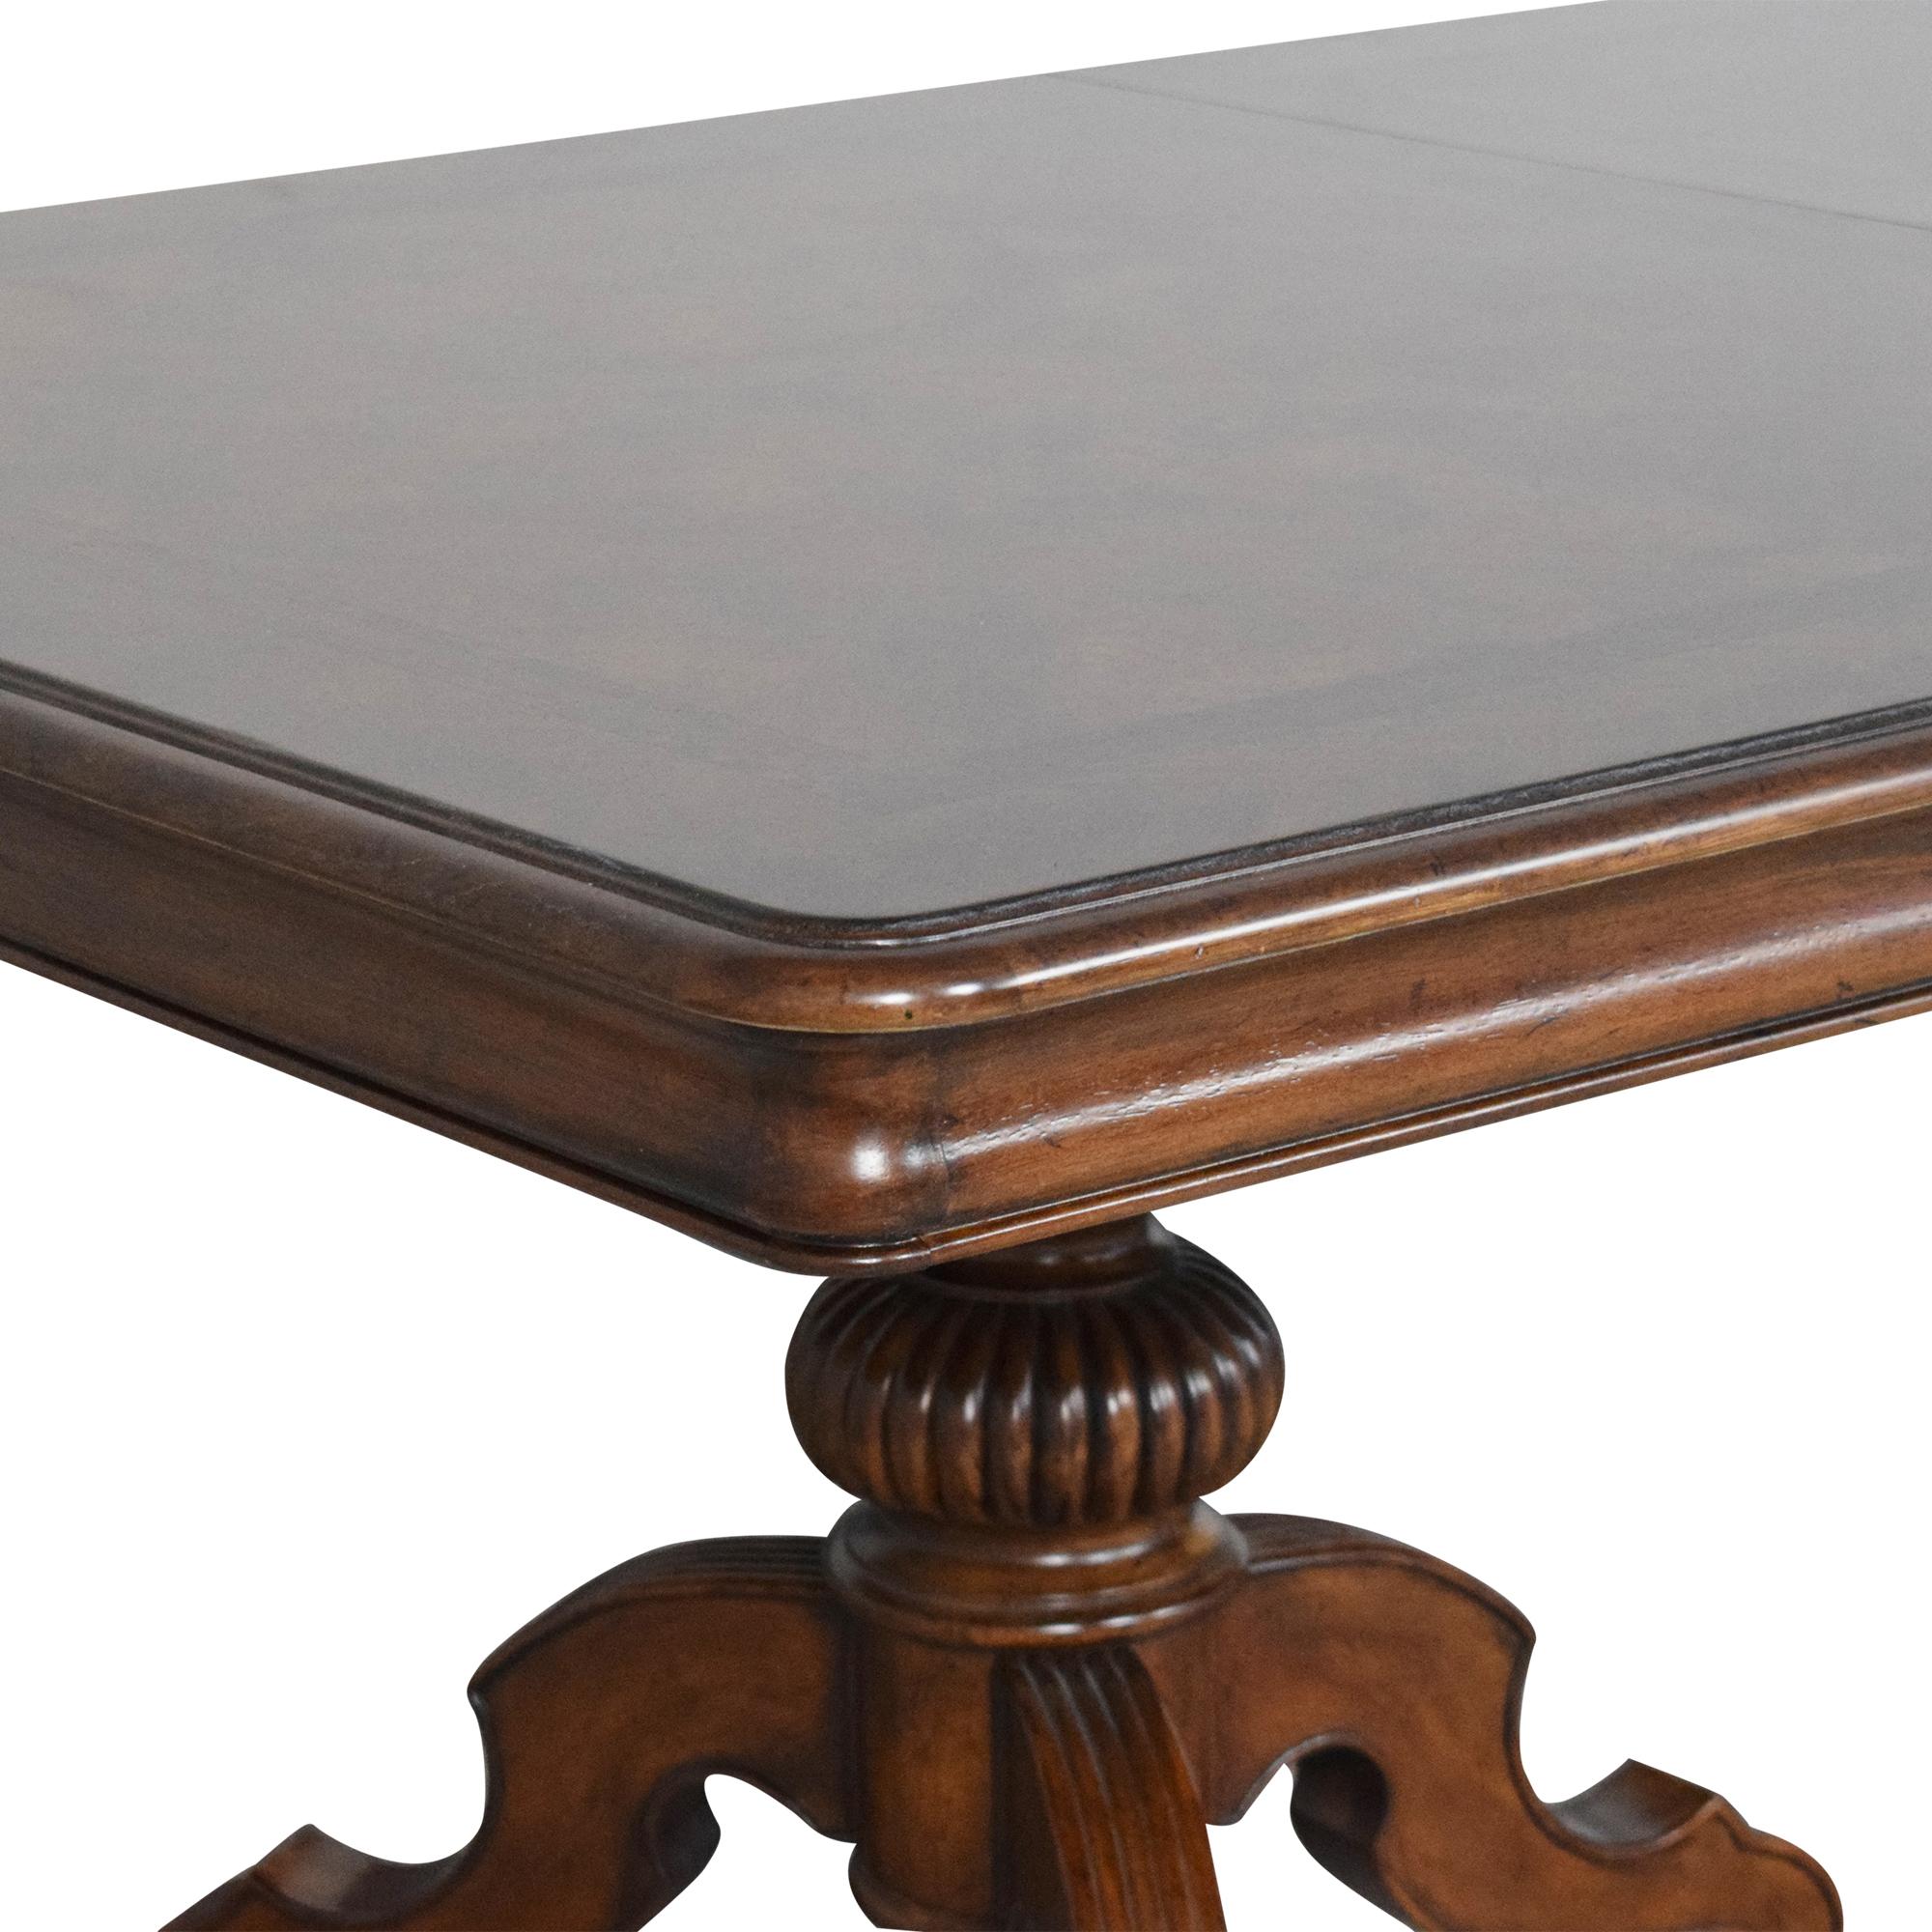 Thomasville Thomasville Ernest Hemingway Castillian Double Pedestal Dining Table Dinner Tables